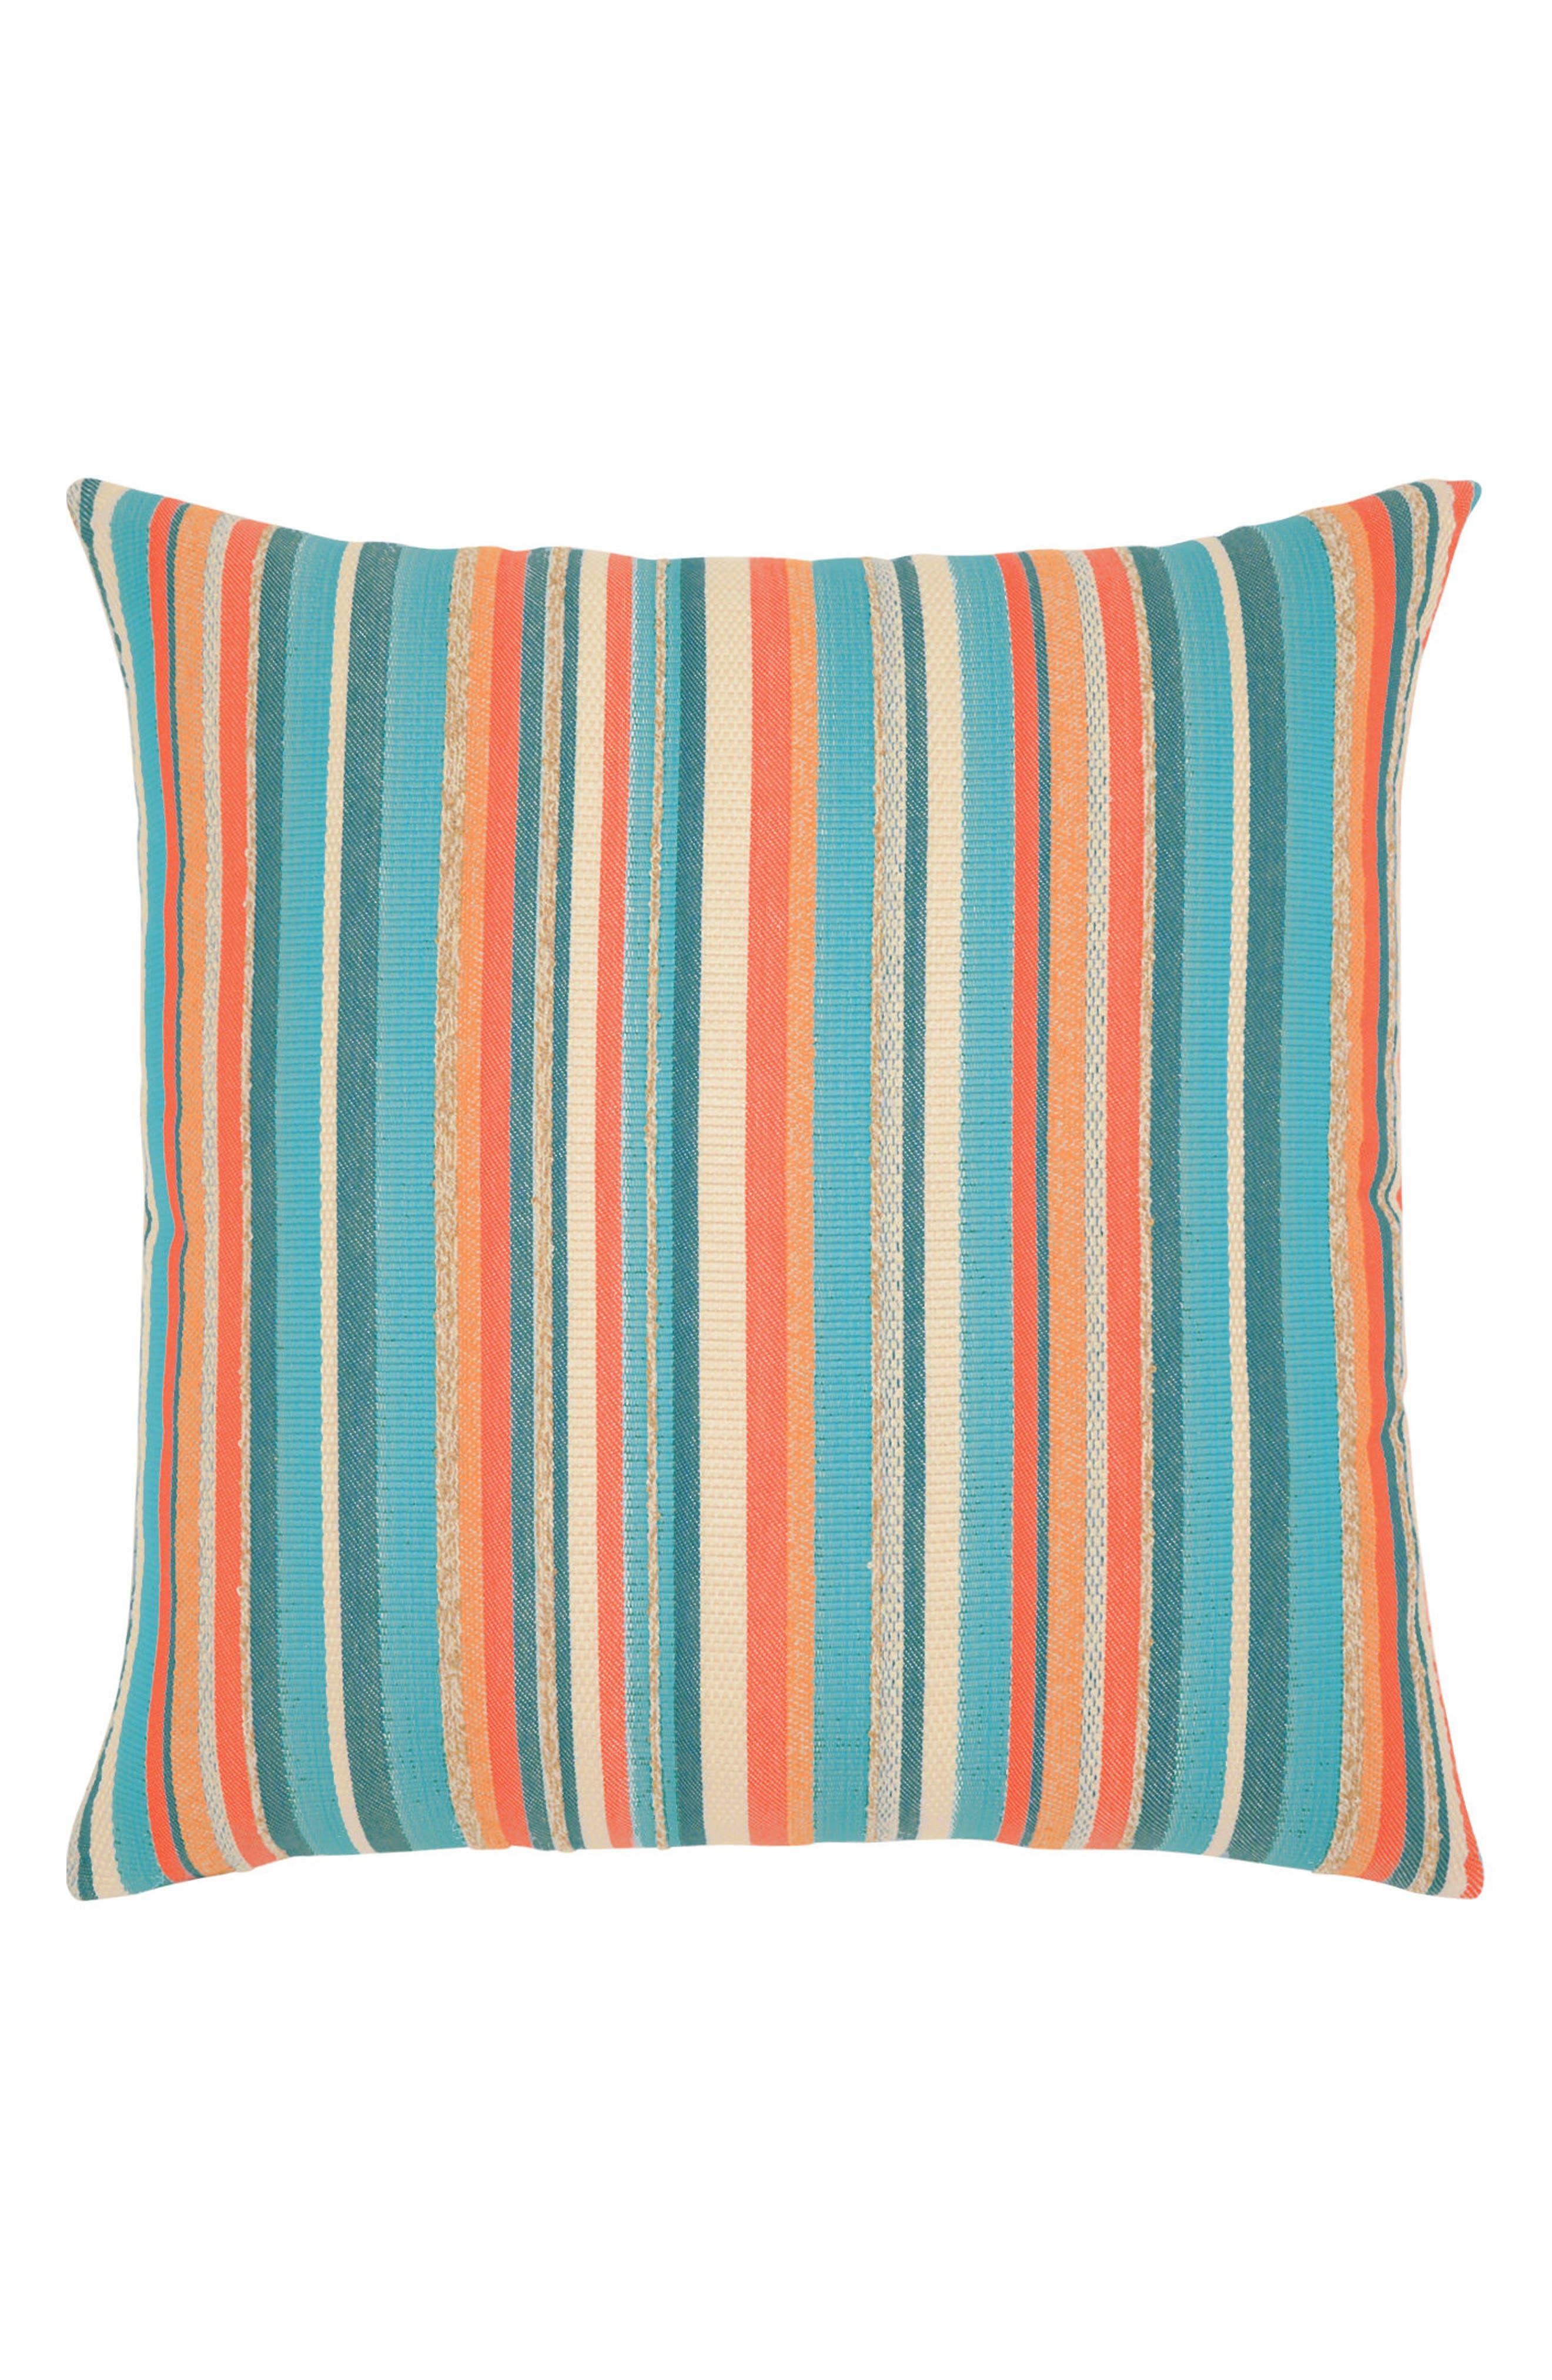 Grand Turk Stripe Indoor/Outdoor Accent Pillow,                             Main thumbnail 1, color,                             Blue/ Orange